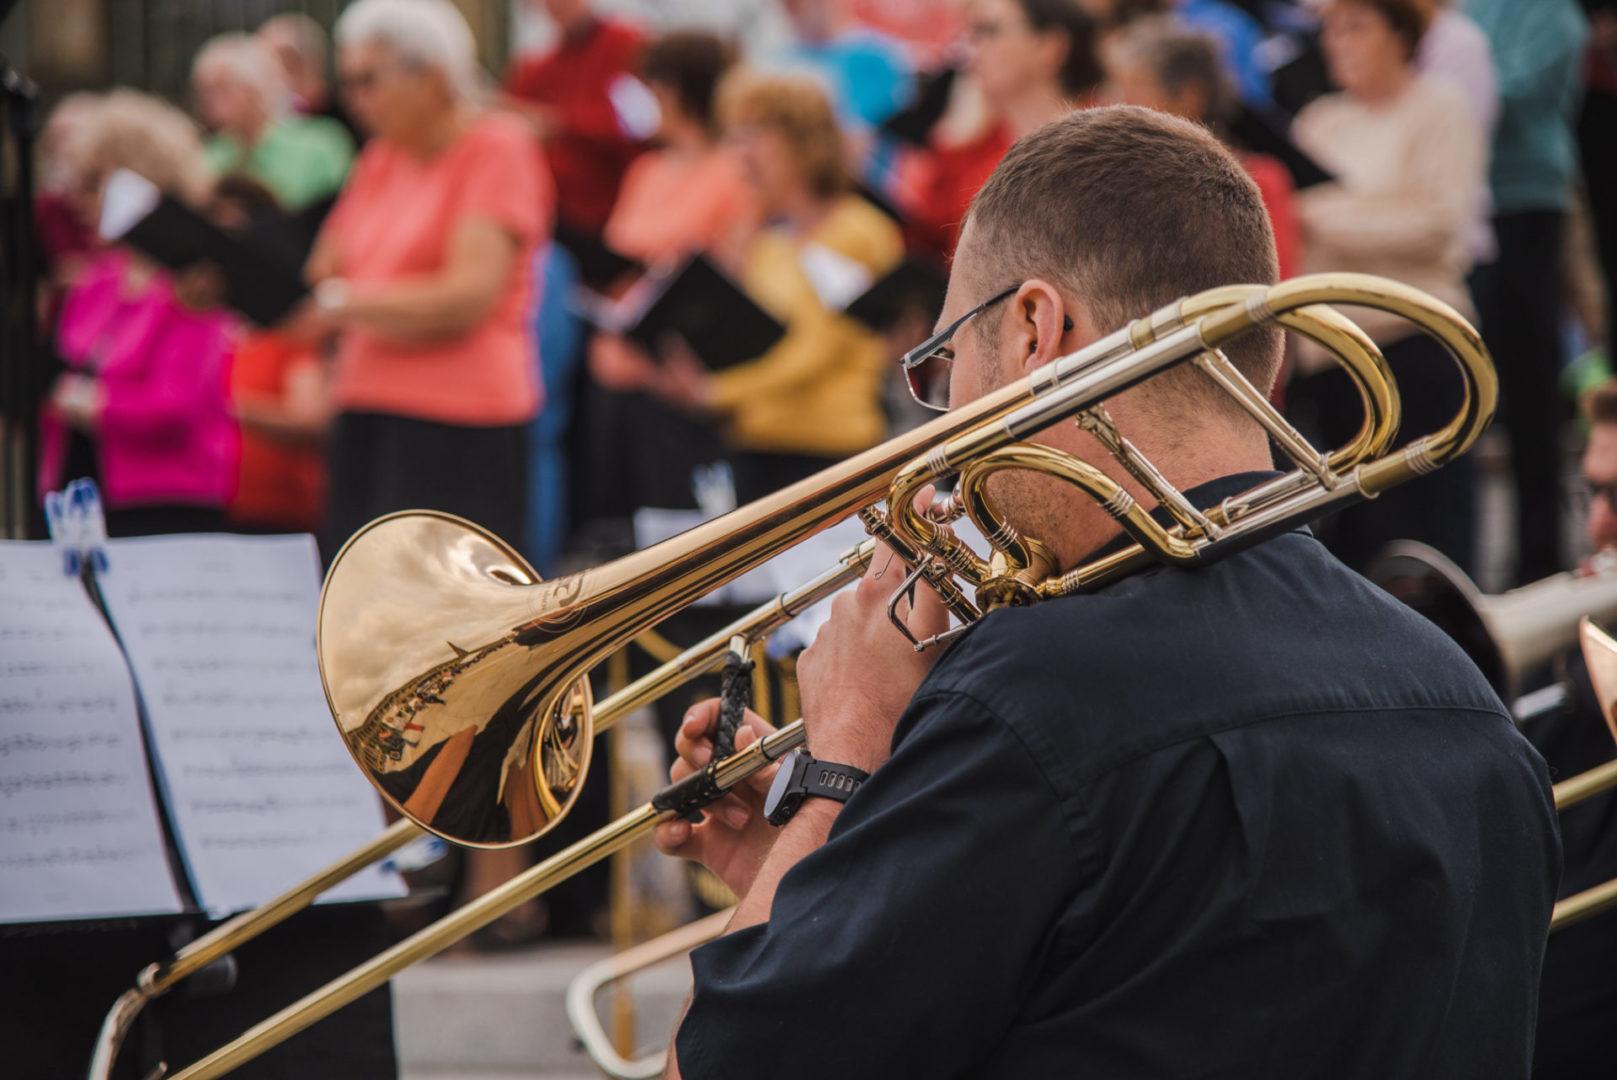 Man paying the trumpet